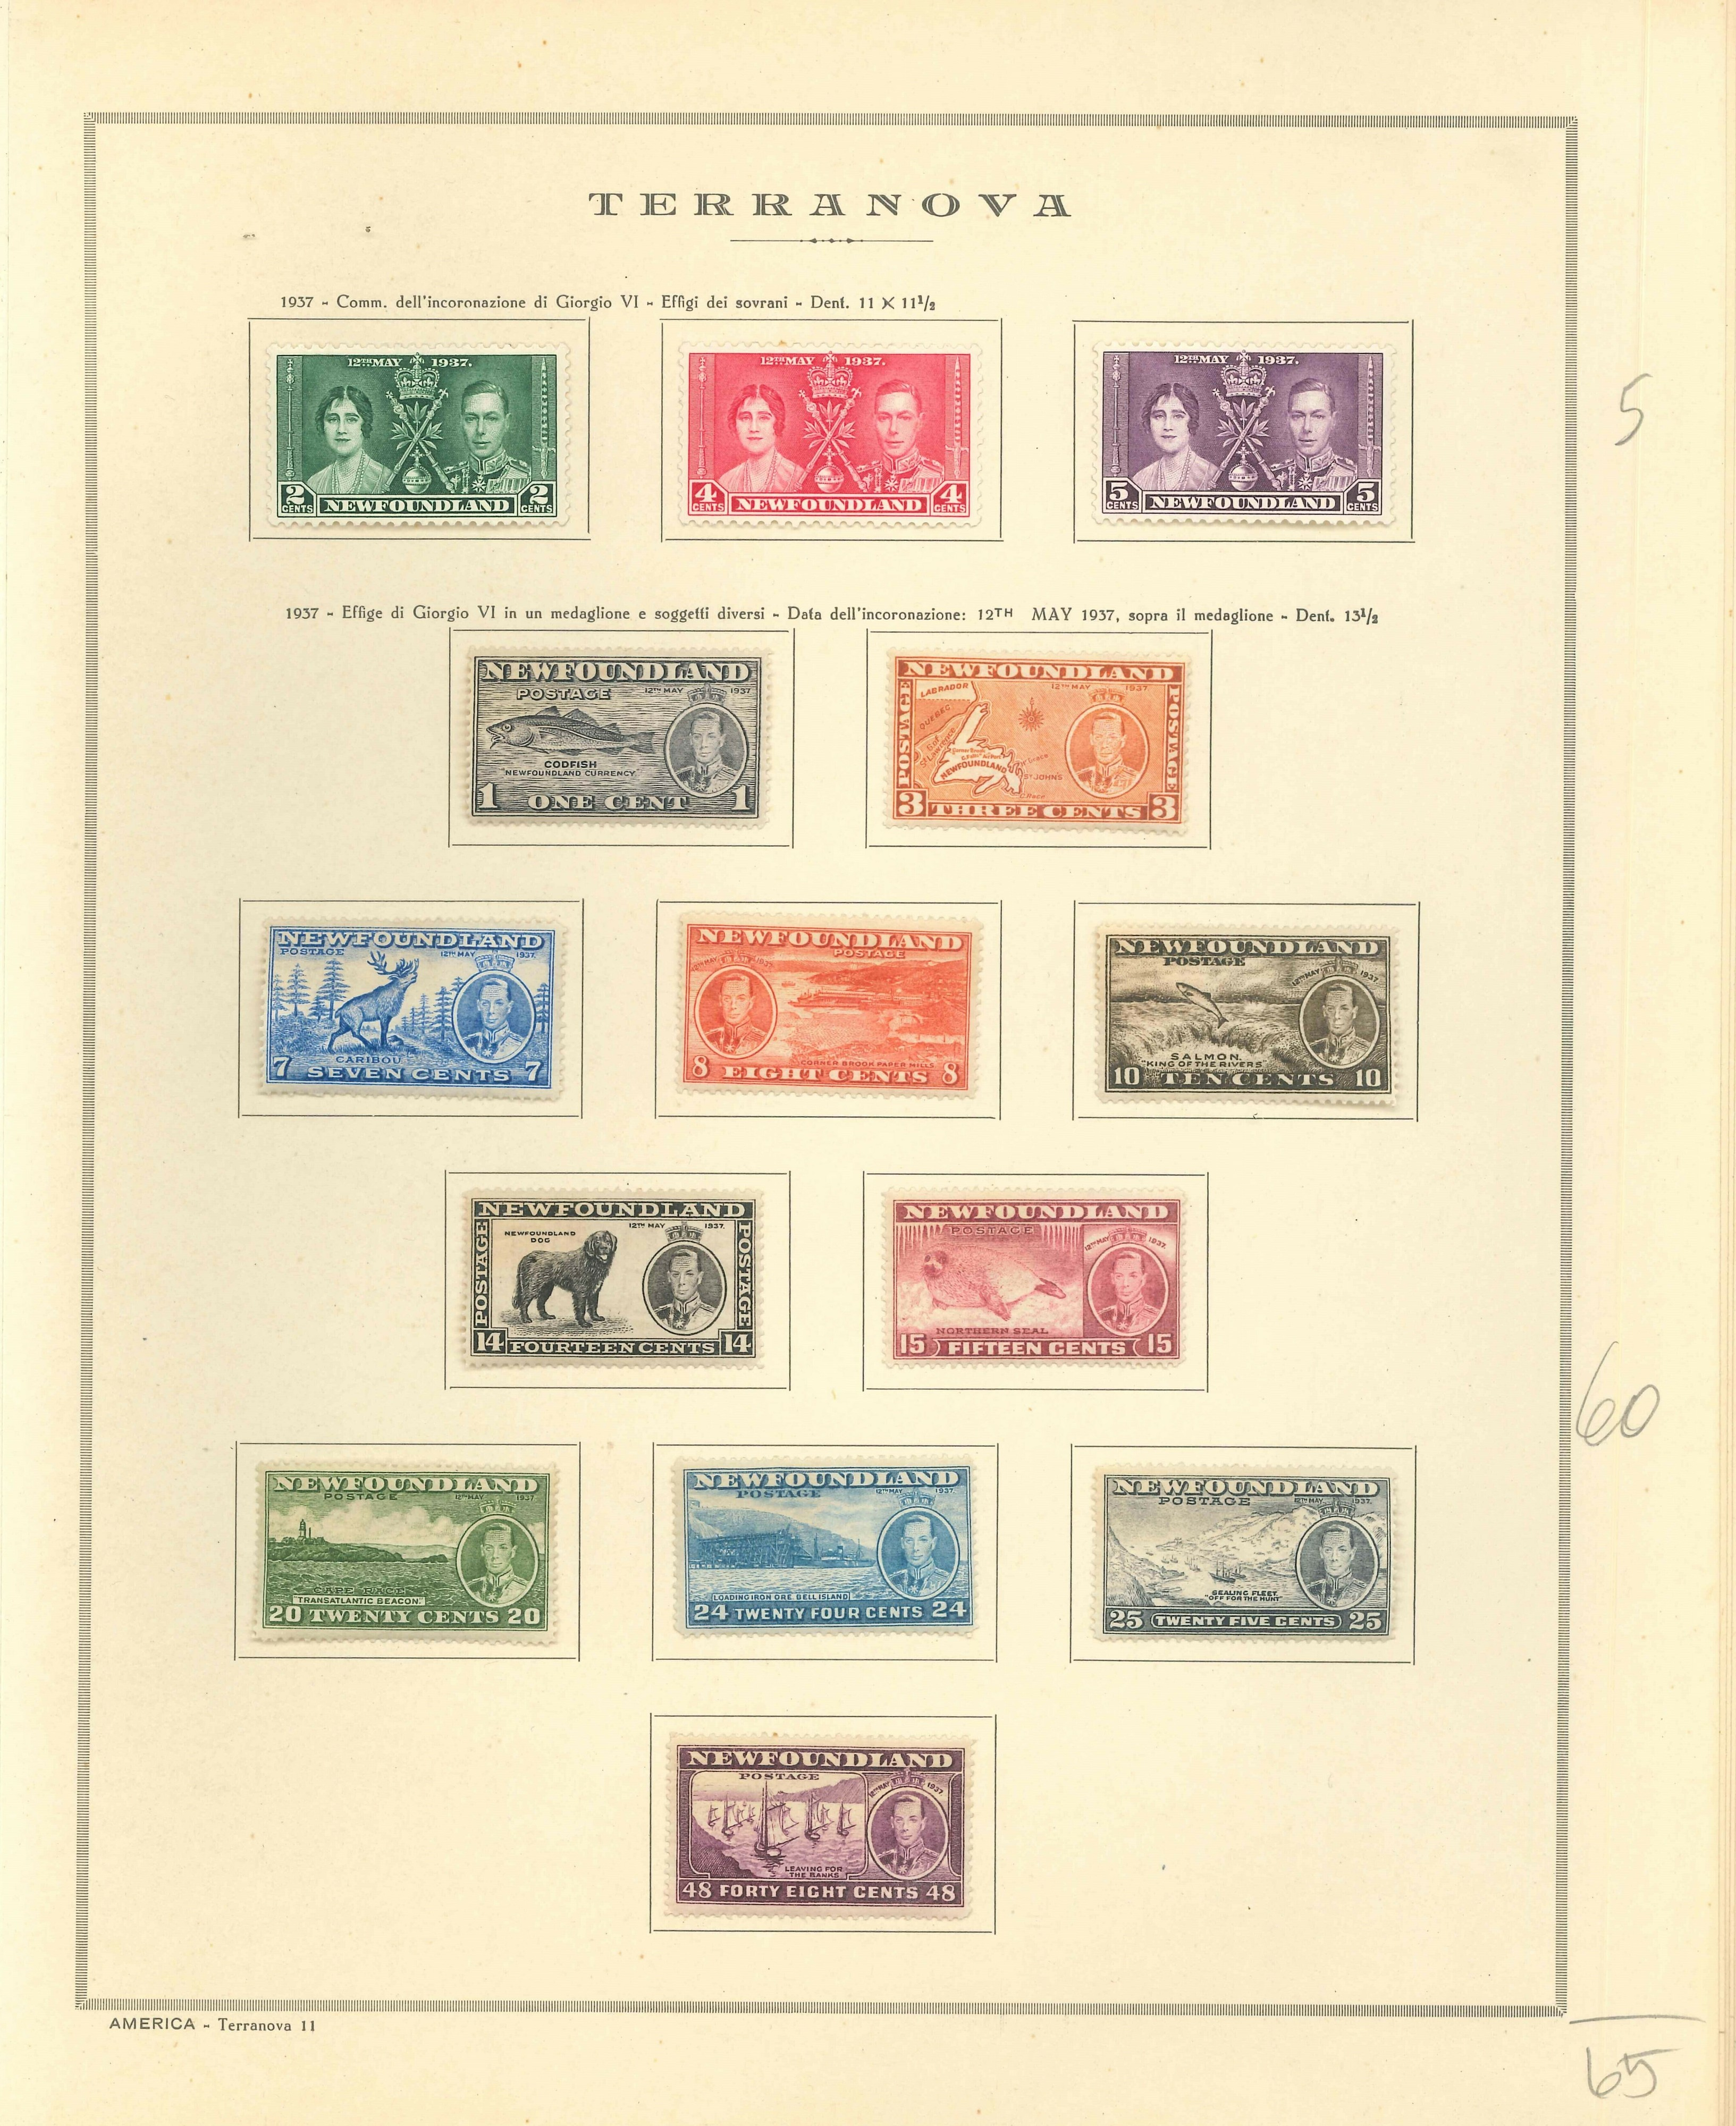 Lot 2314 - NEWFOUNDLAND, NOVA SCOTIA Lots & Collections -  Ponte Auction House Stamps Auction 505